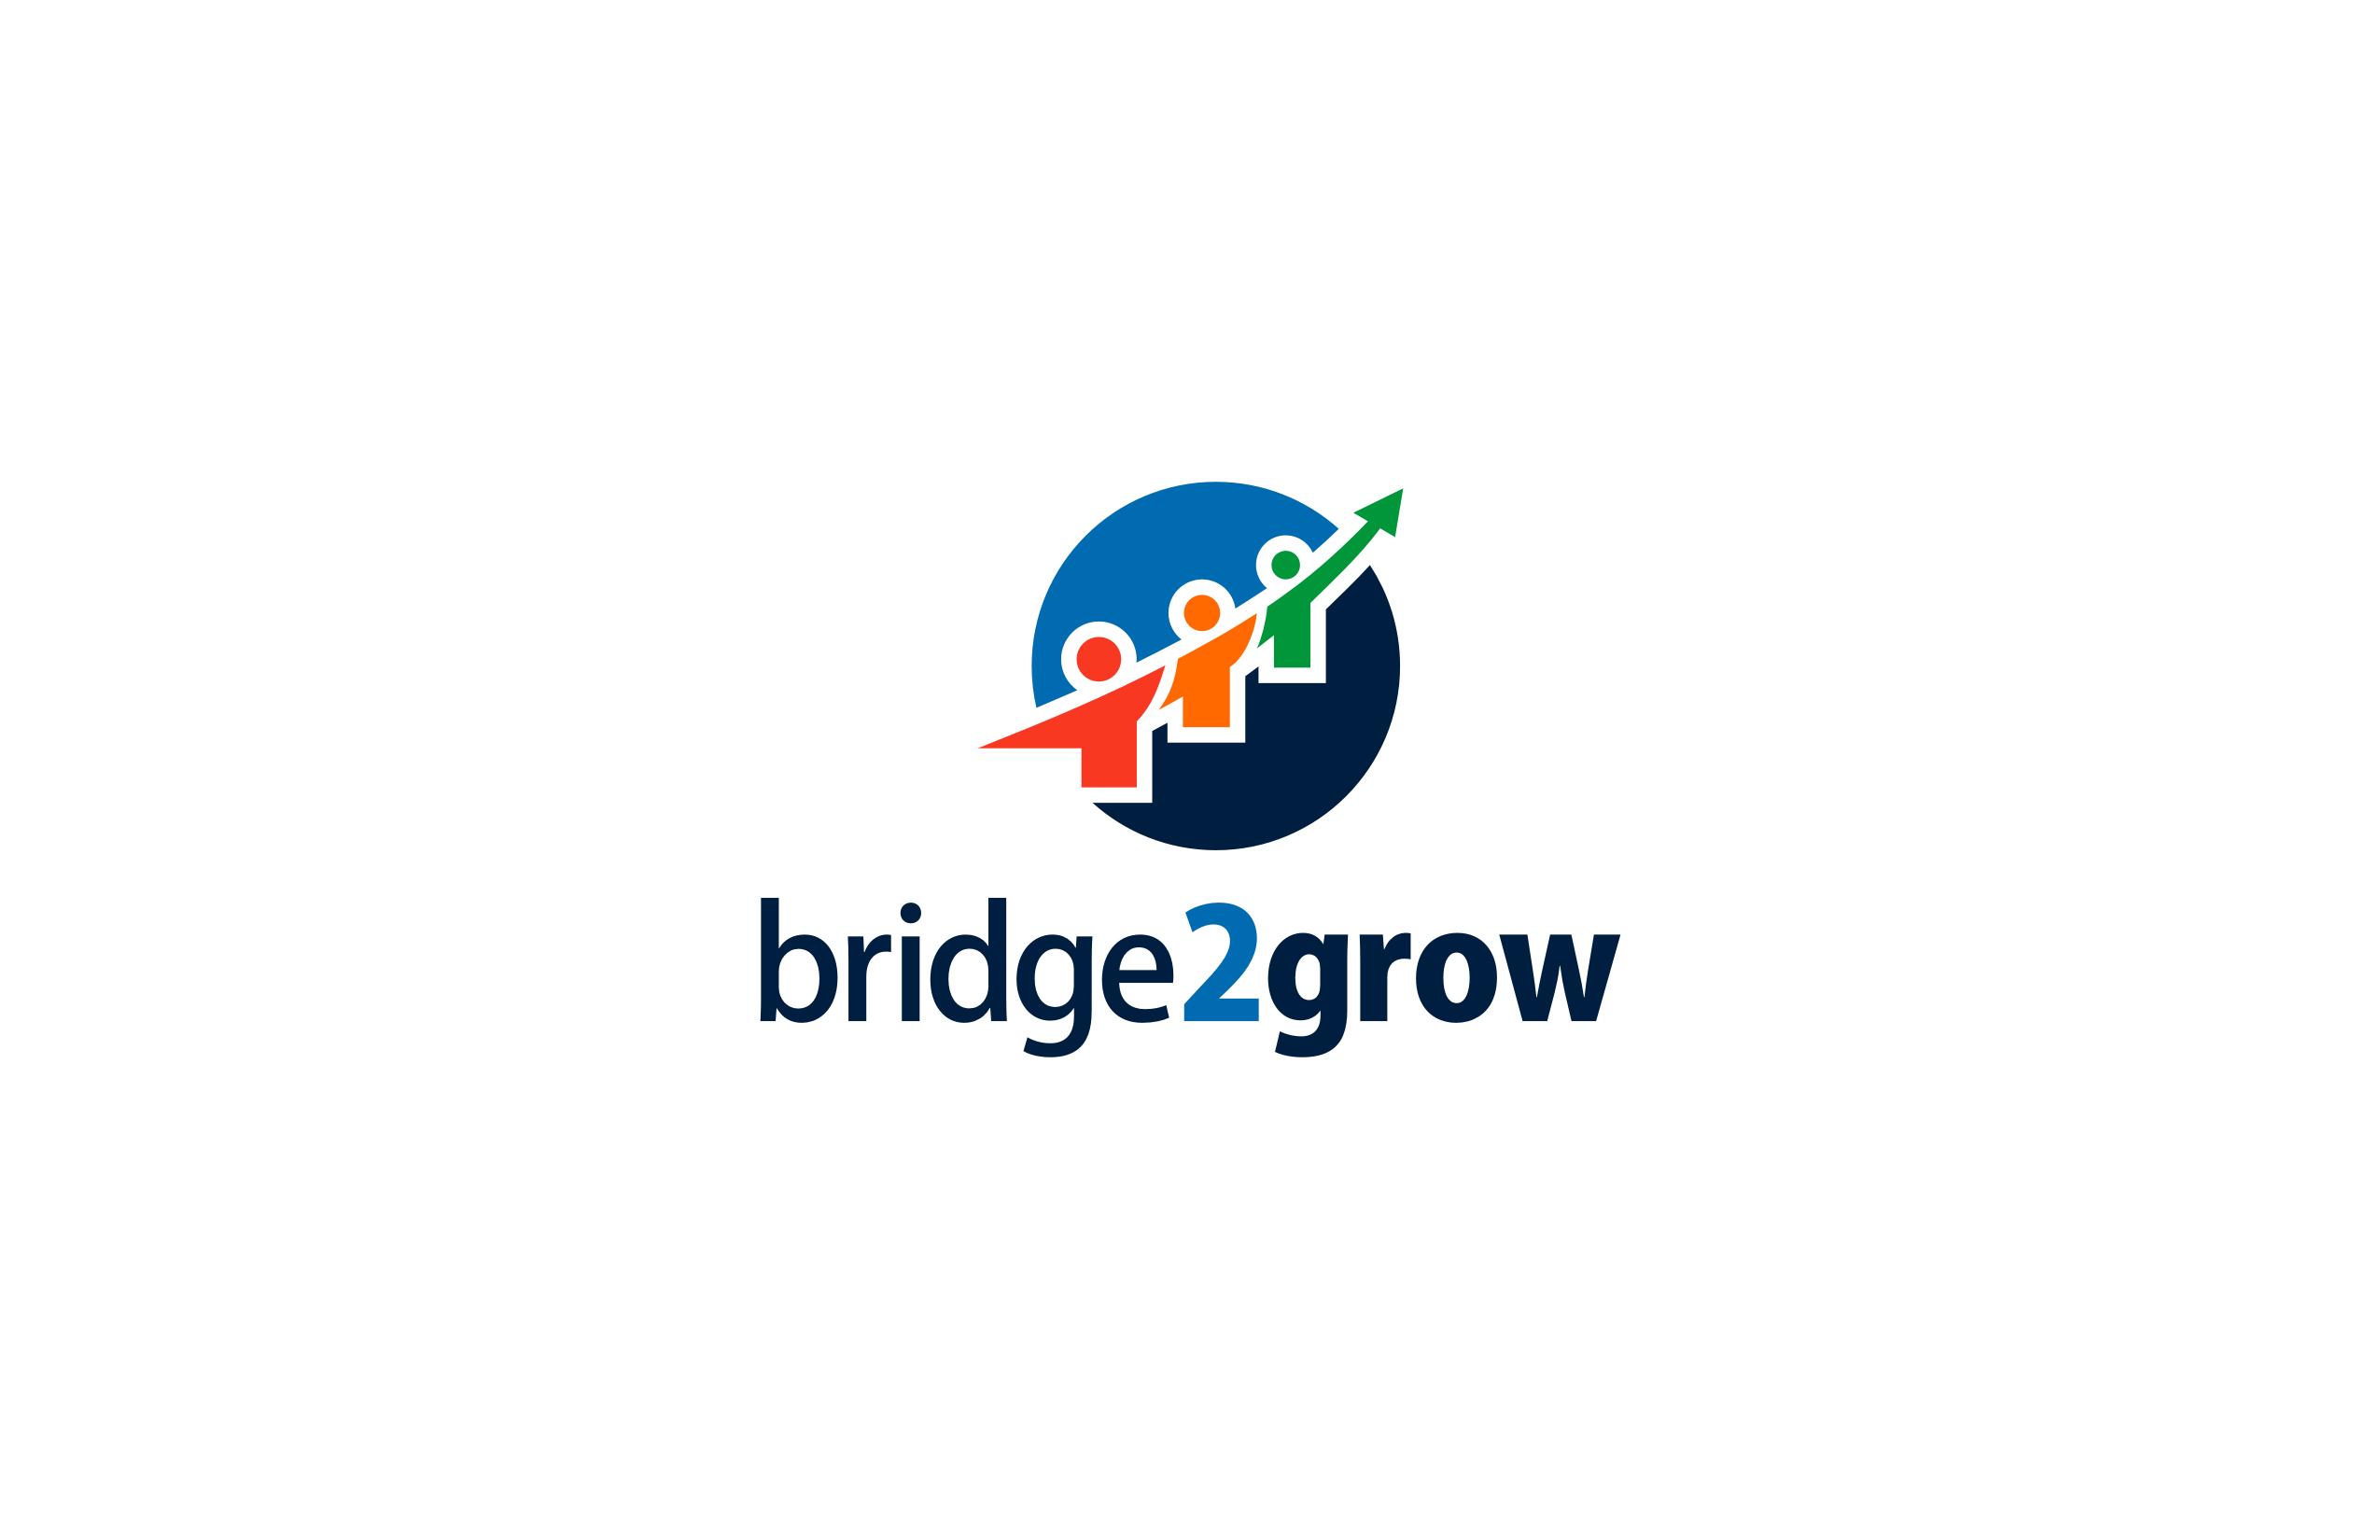 Bridge us towards the new bridge2grow-logo!